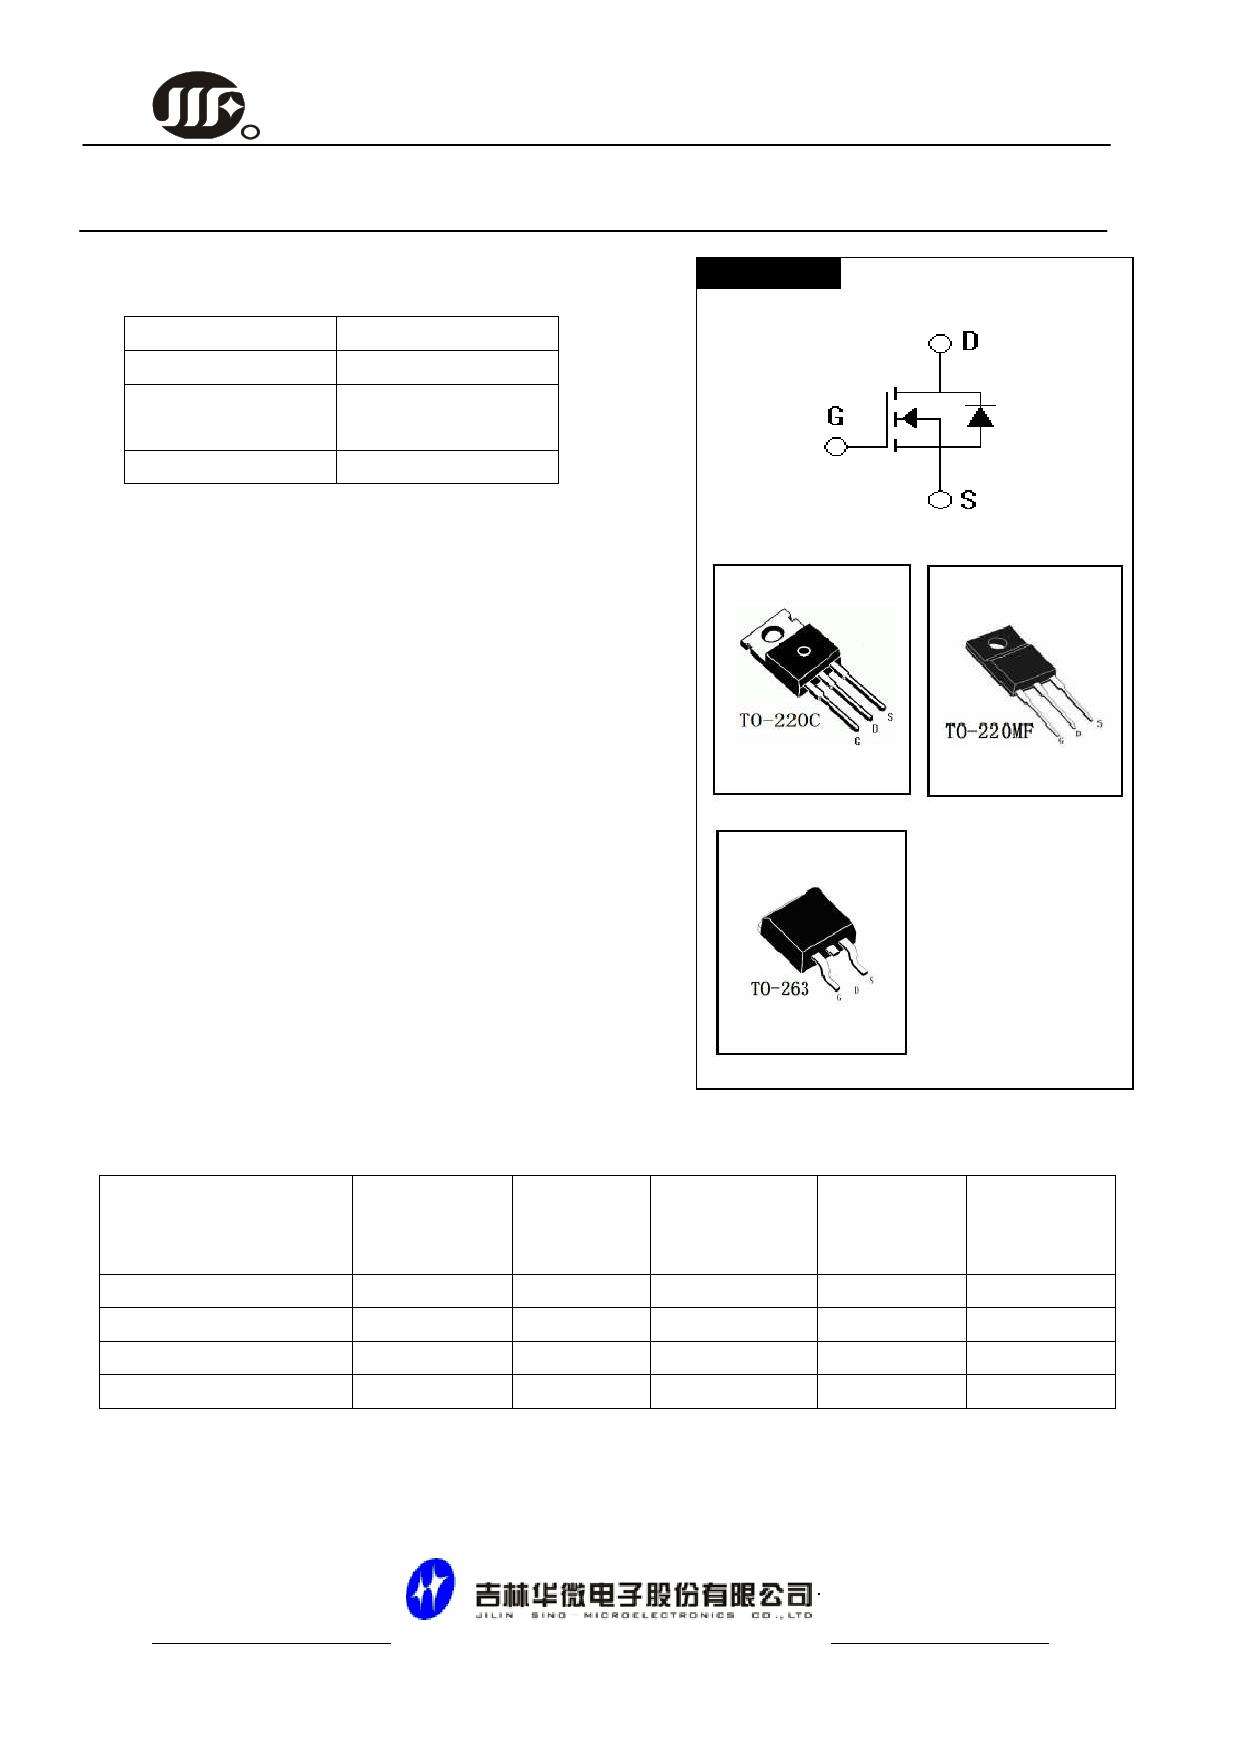 JCS75N75F datasheet